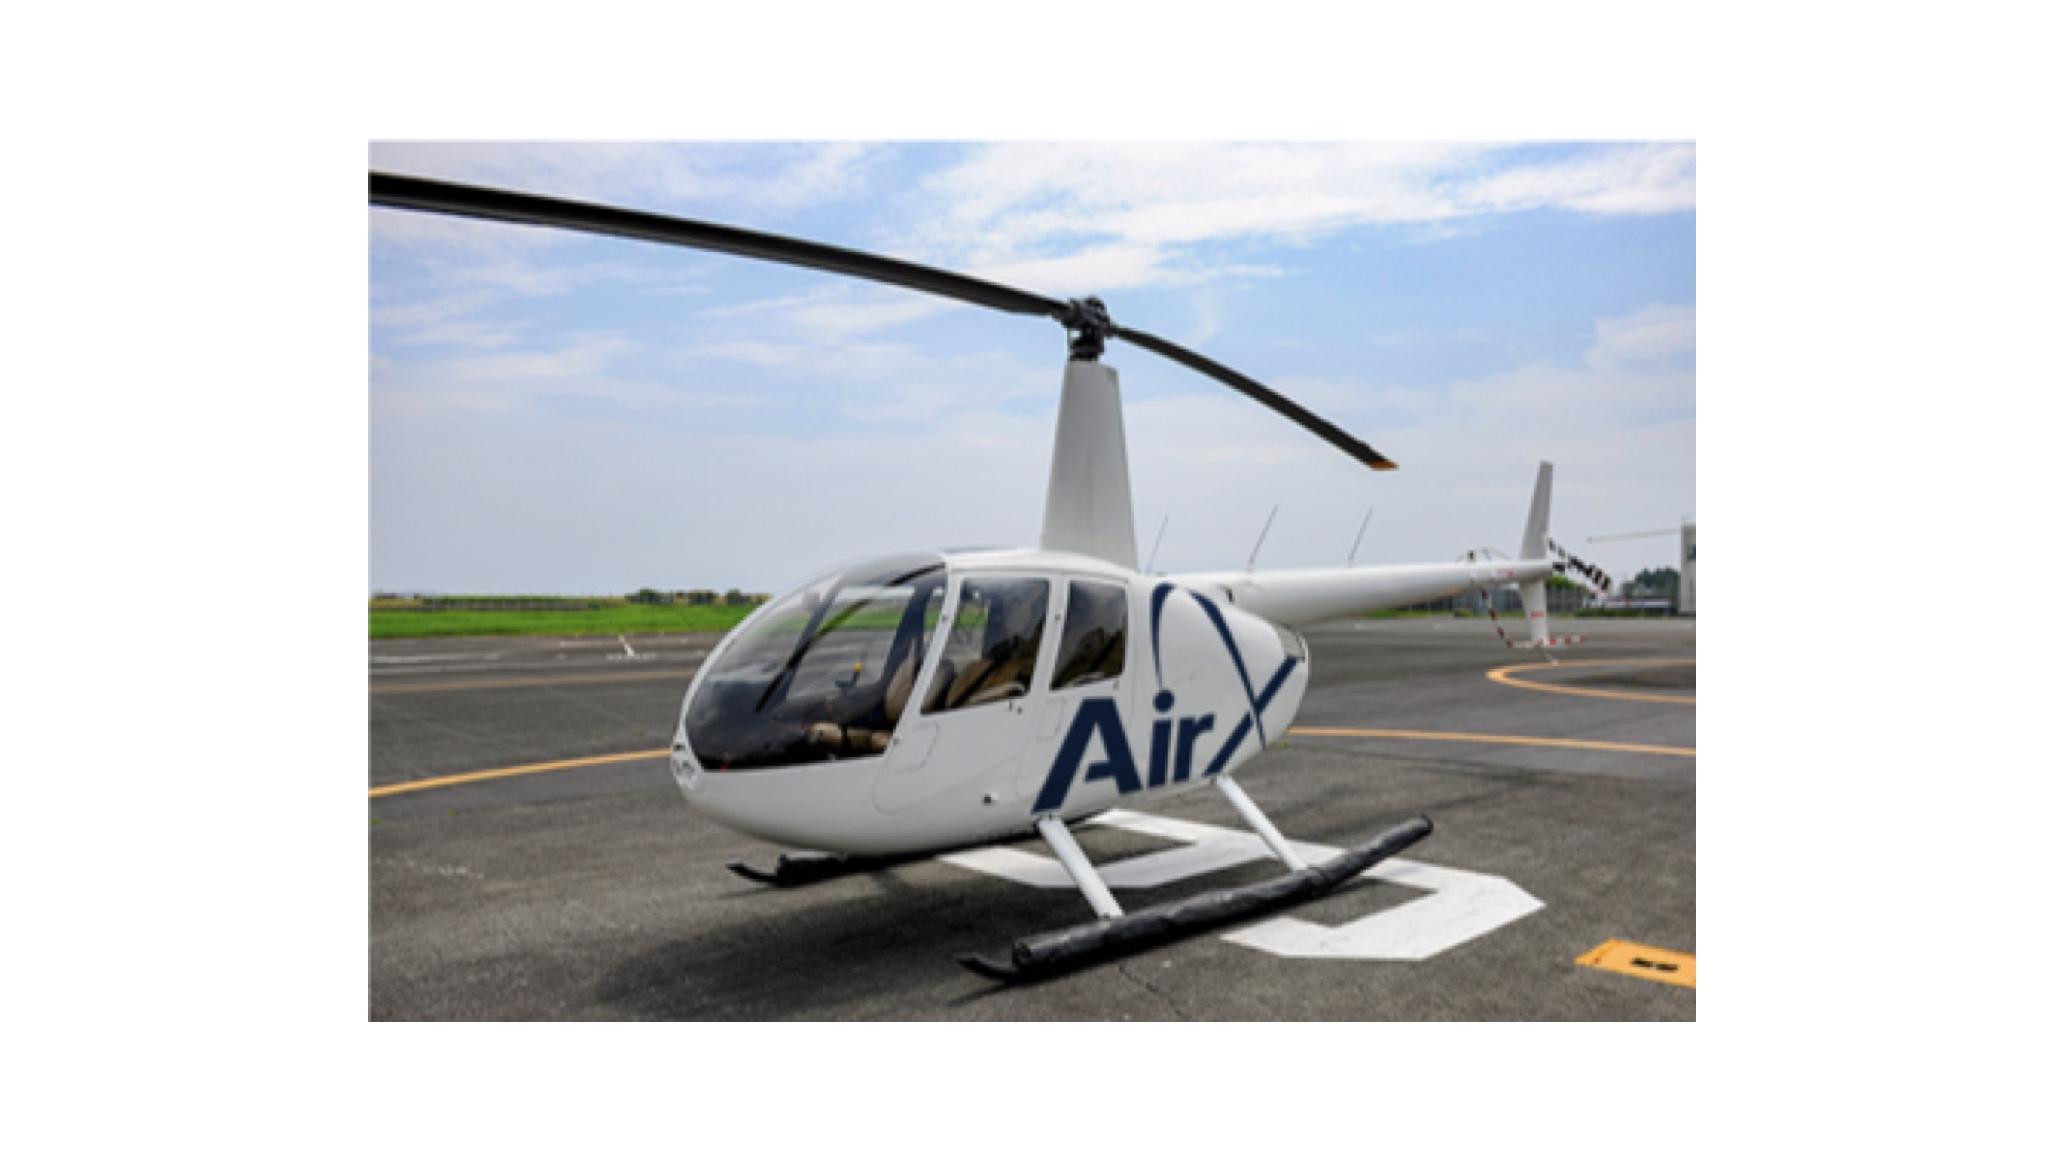 AirX×プリンスホテル | 東京〜箱根間を35分で移動するヘリコプター直行便の実証実験開始